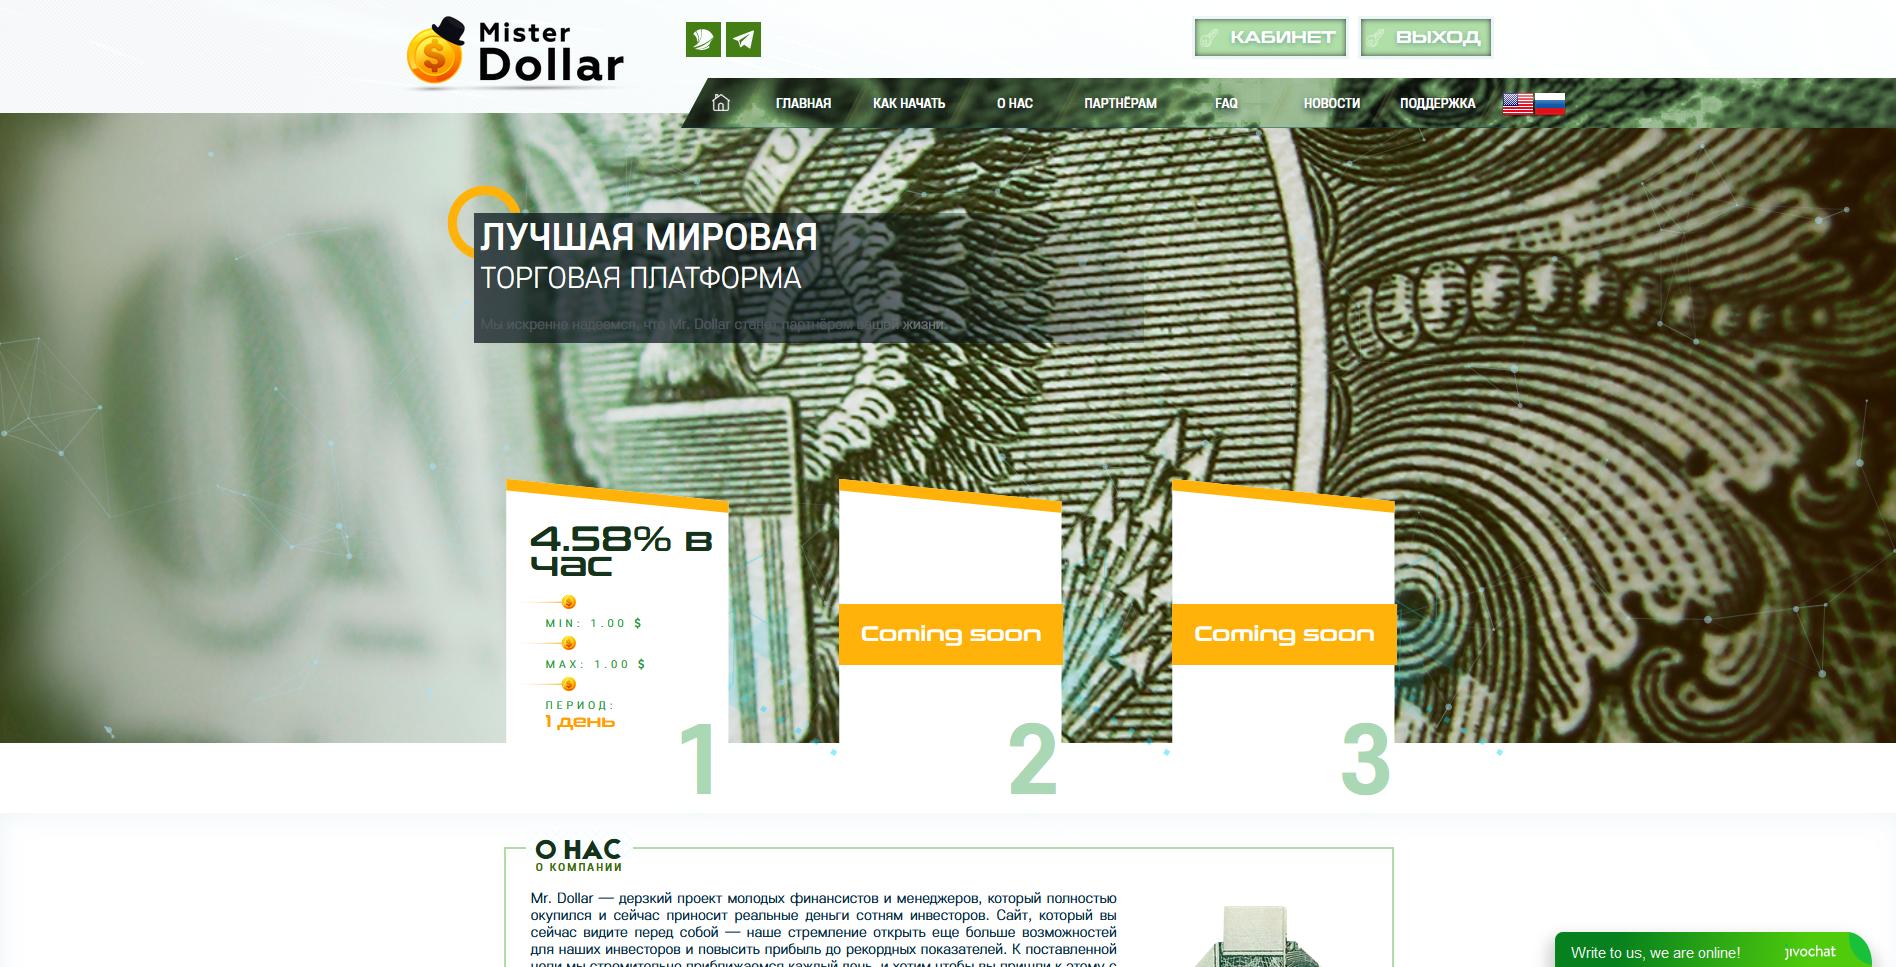 mister-dollar